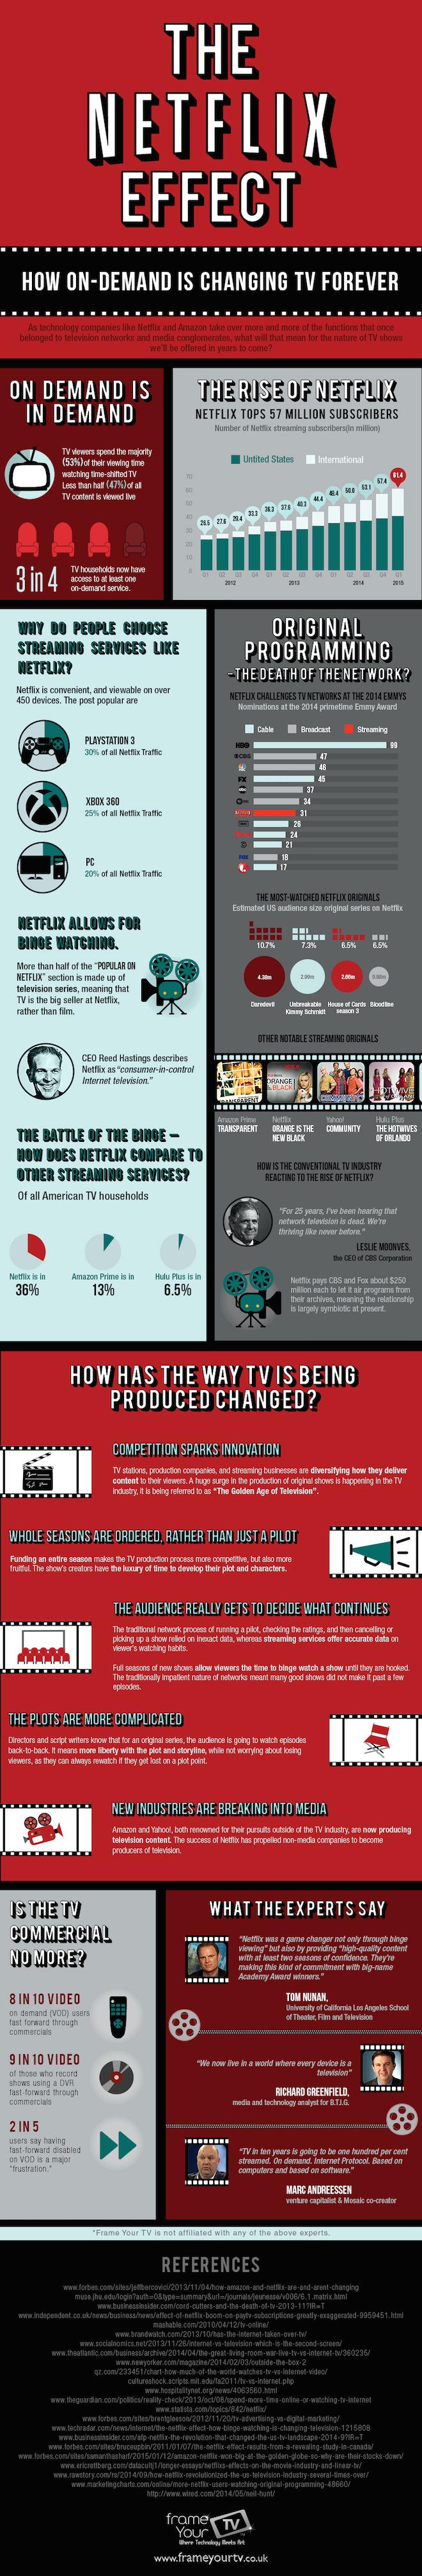 Netflix Effect Infographic